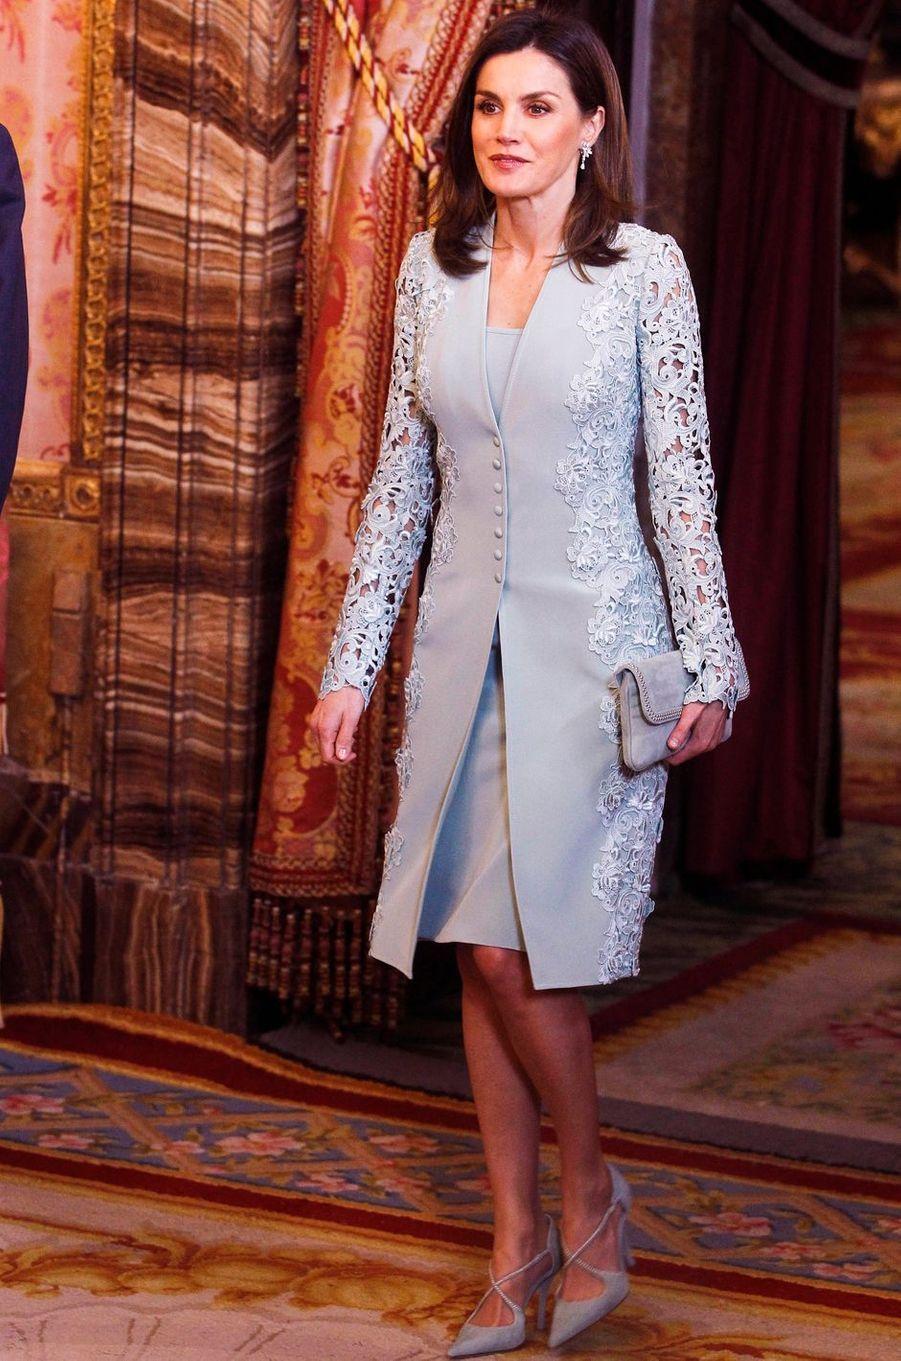 La reine Letizia d'Espagne en Felipe Varela, le 20 avril 2018